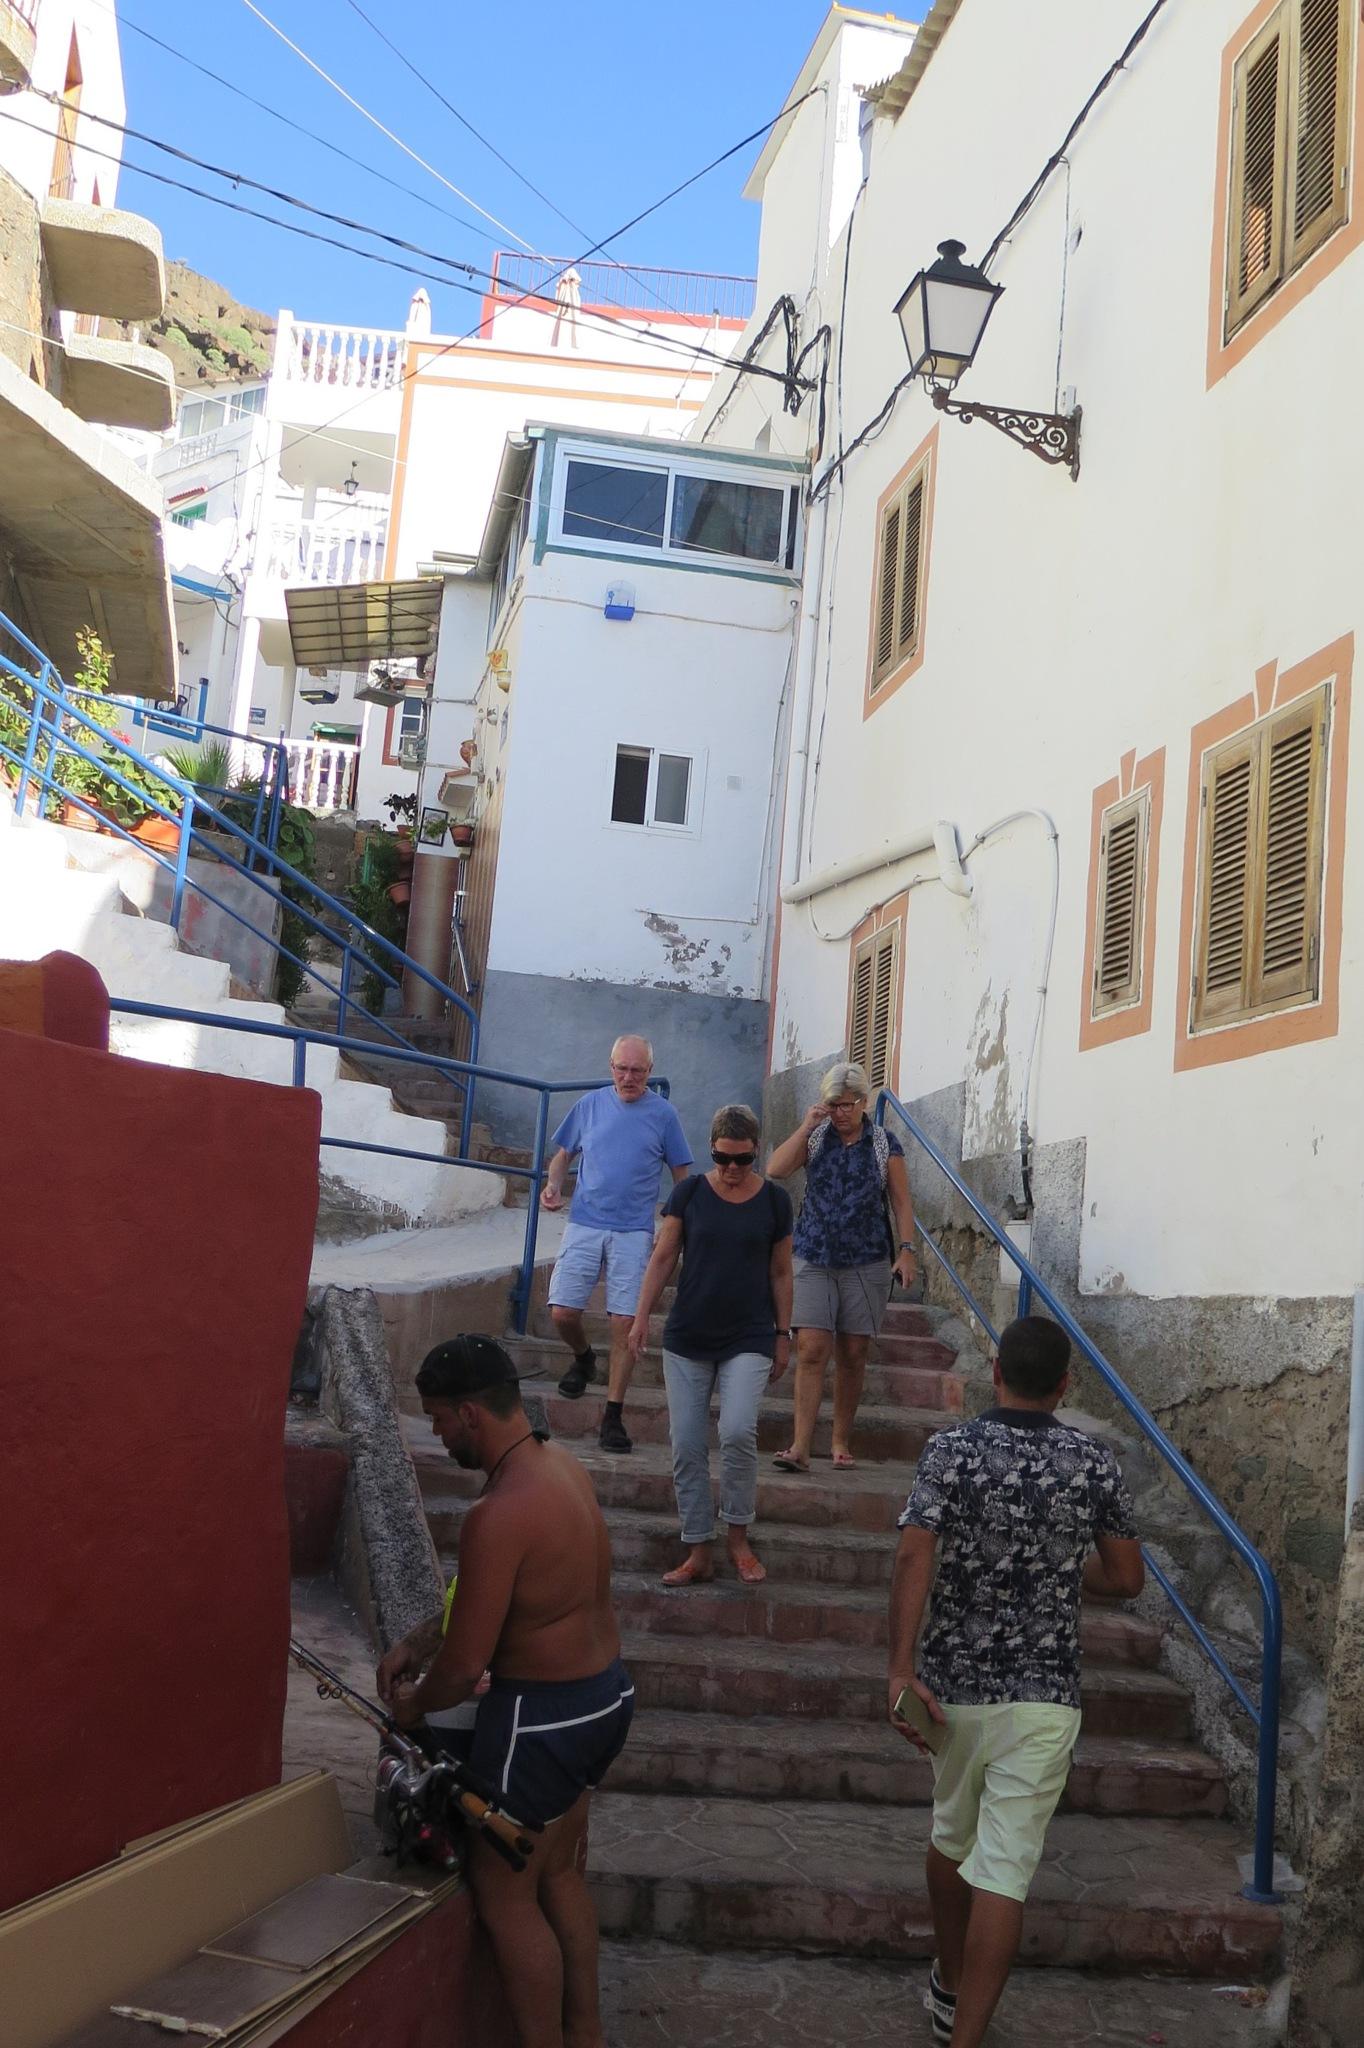 Puerto de Mogan Village by astarot